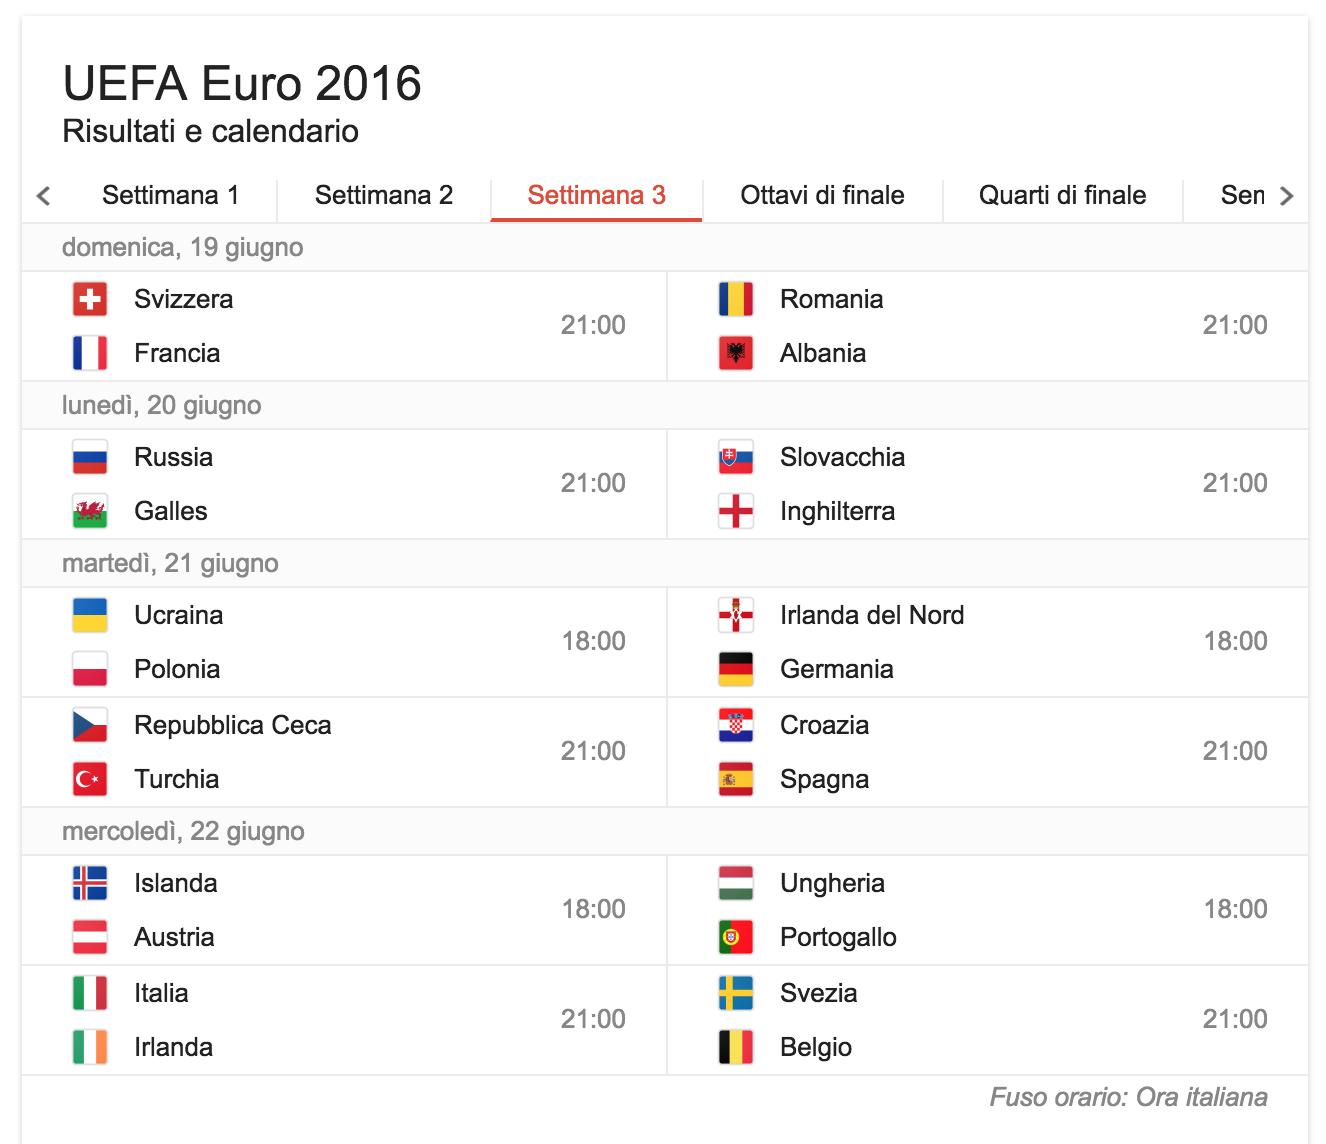 settimana 3 calendario partite europei di calcio 2016